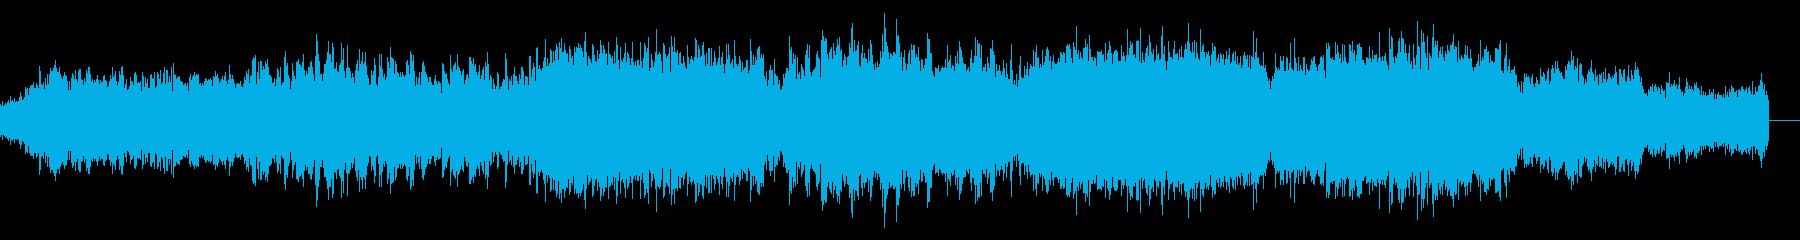 SFサスペンスなアンビエントIDMの再生済みの波形